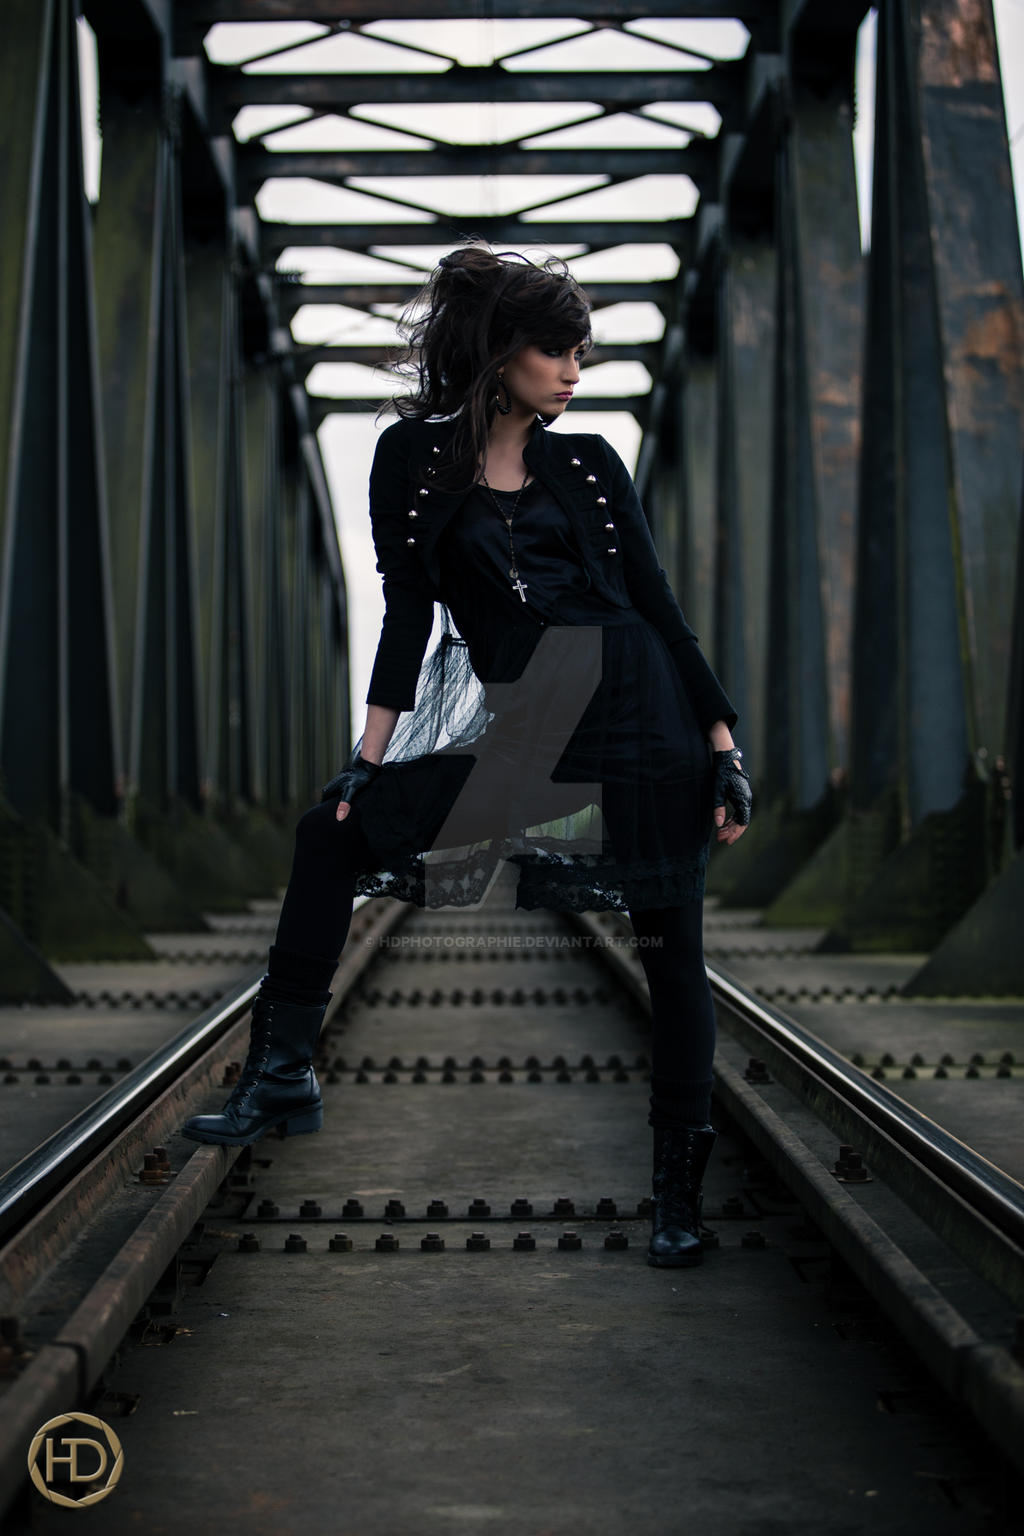 METAL BRIDGE by HDphotographie